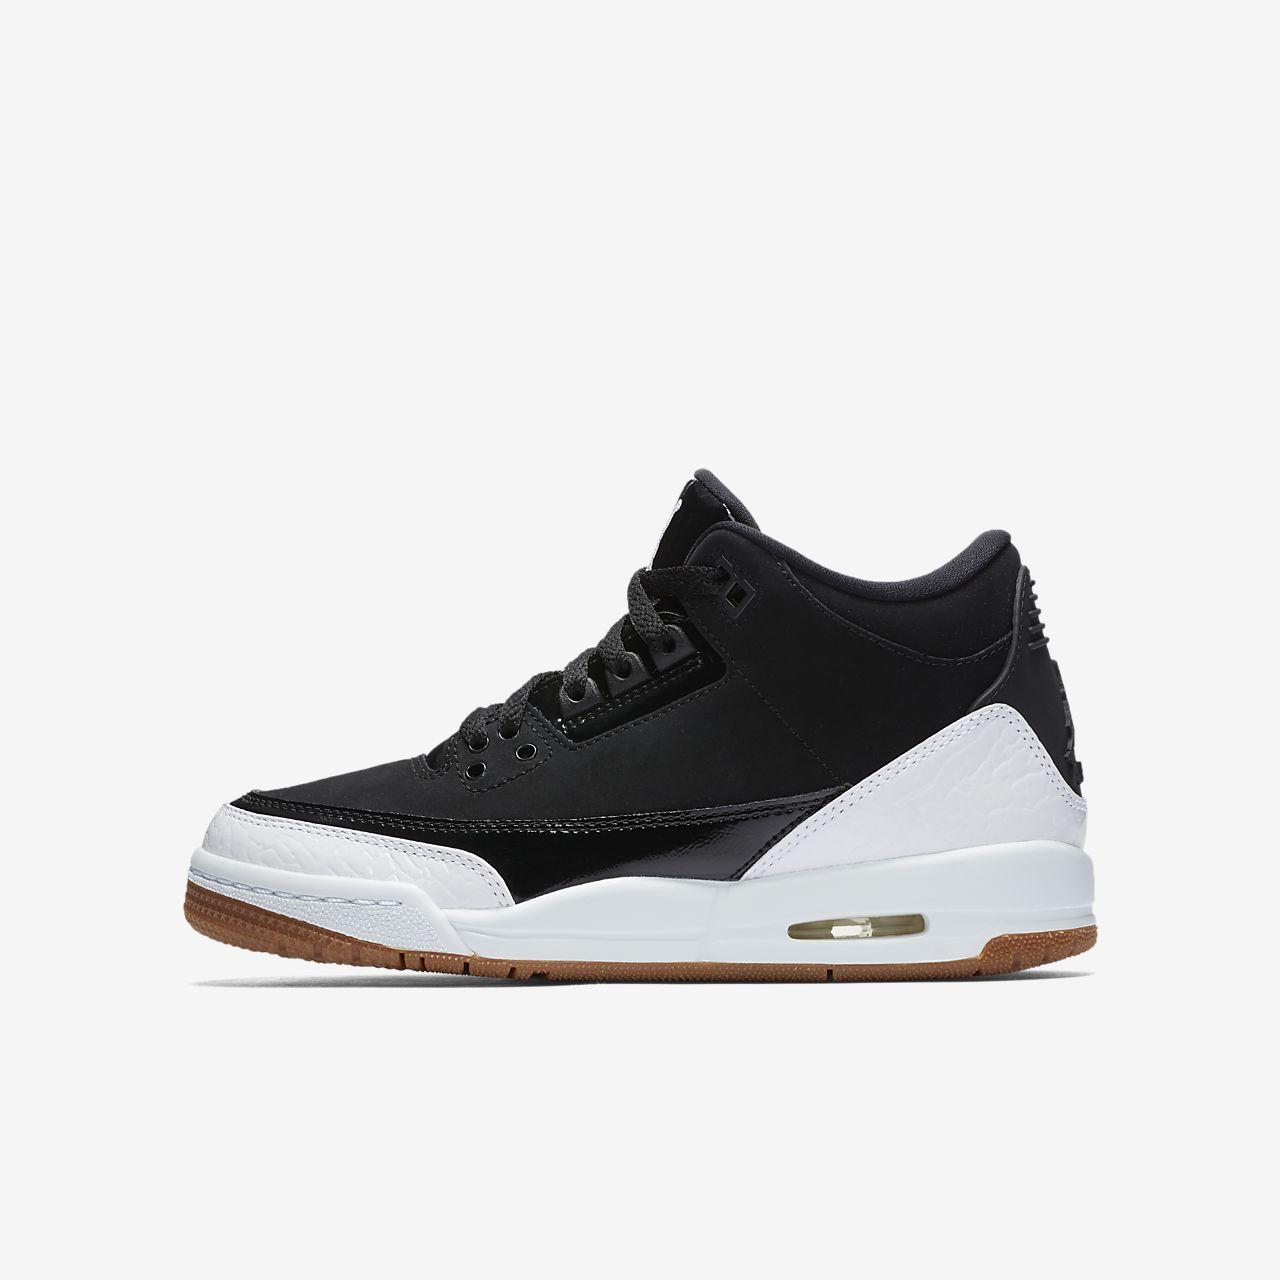 best sneakers 44185 4ca6e ... australia air jordan 3 retro sko for store barn 85a8d 6ad92